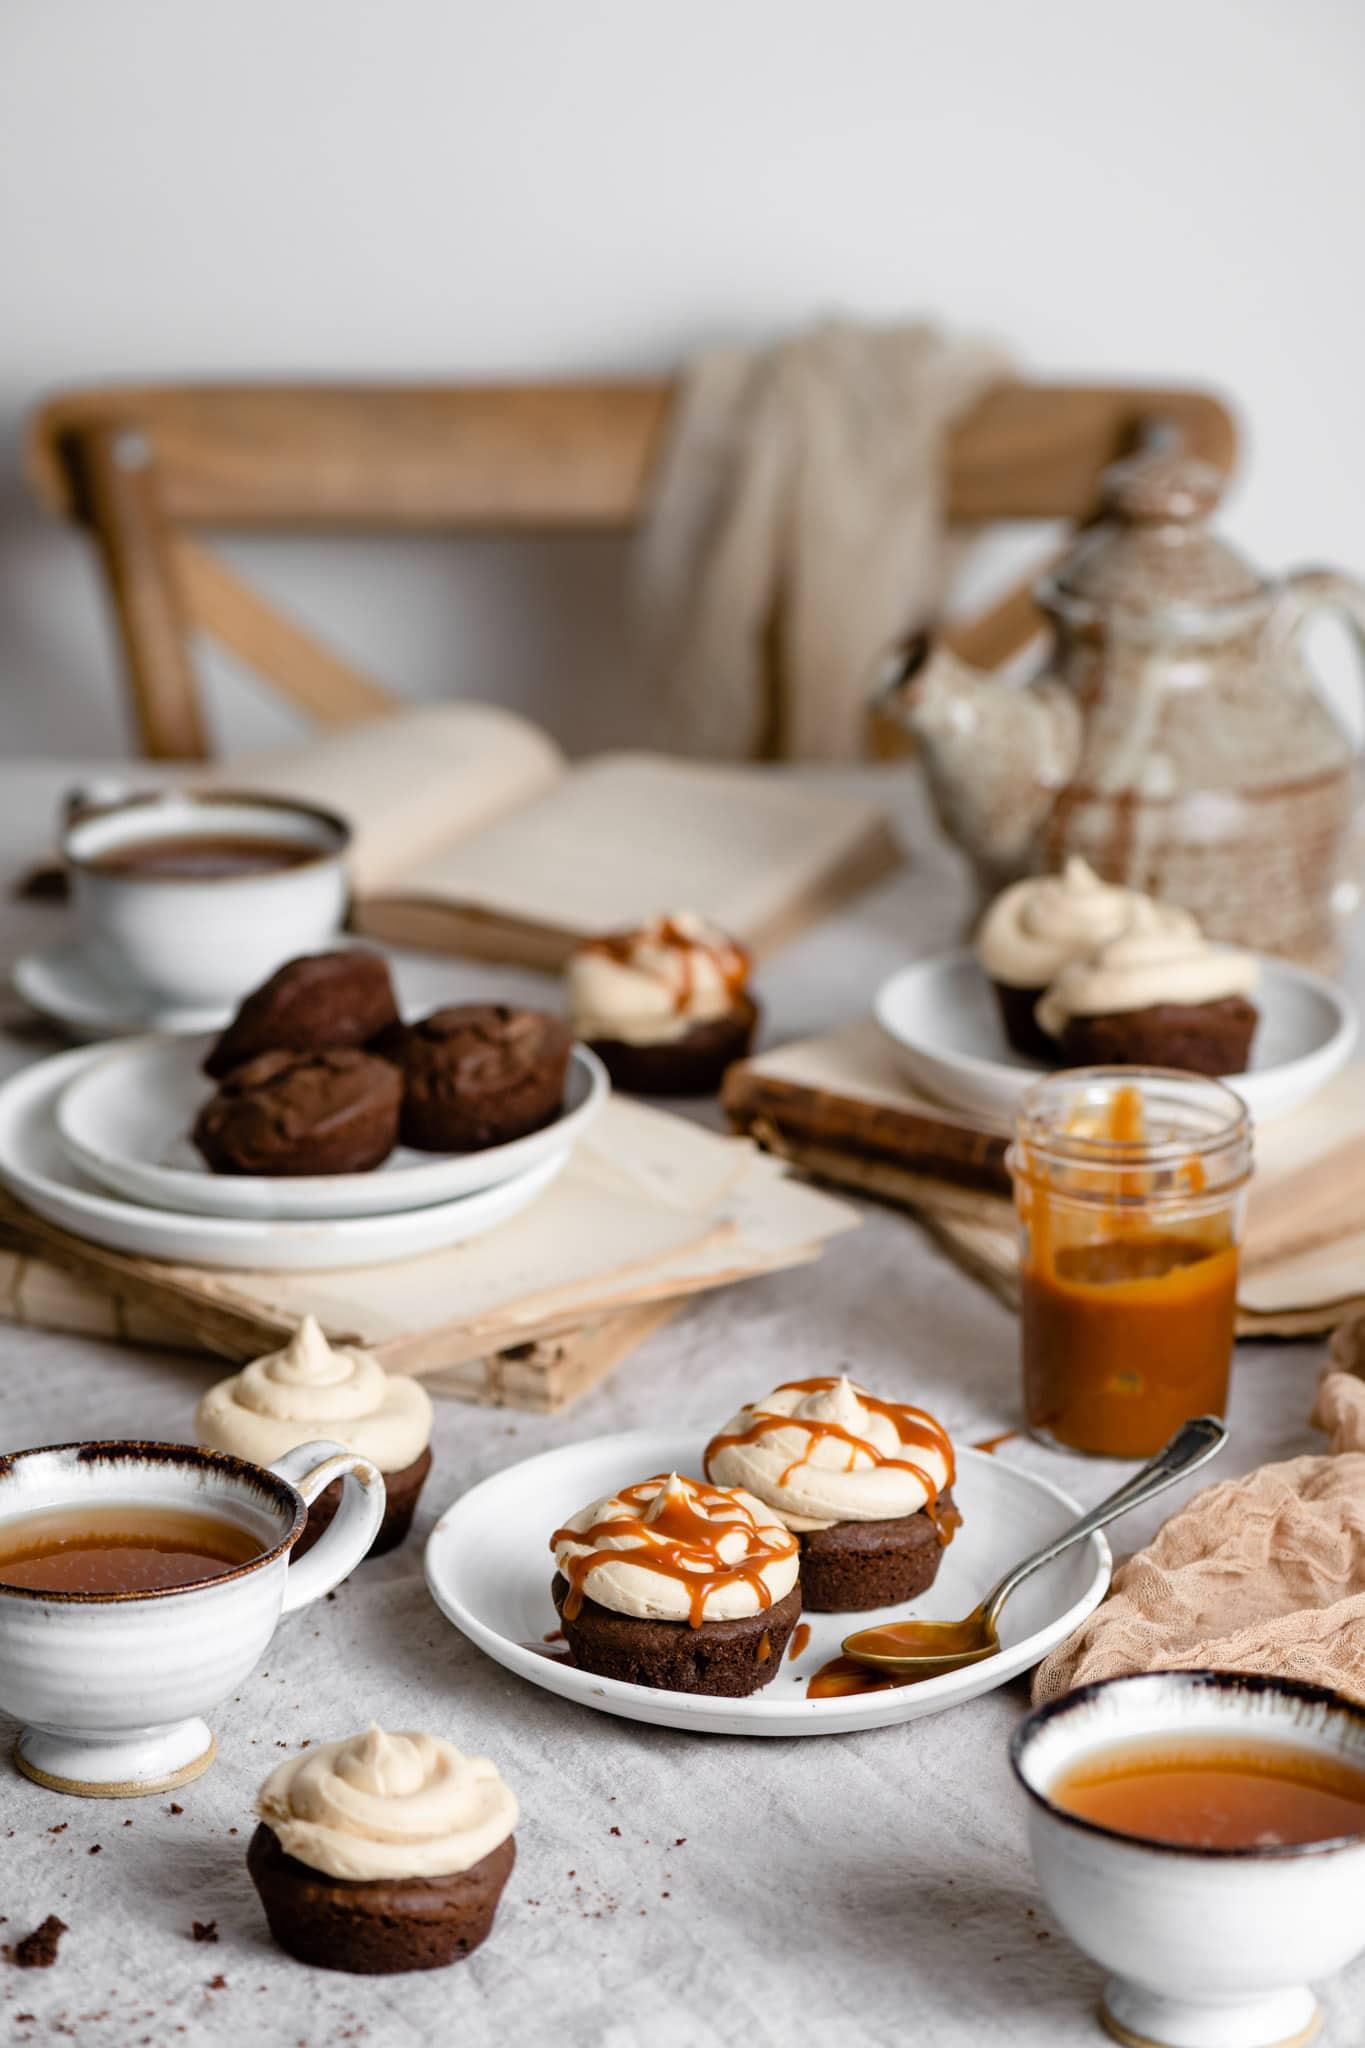 Homemade Caramel and Chai Buttercream on Brownie Cake